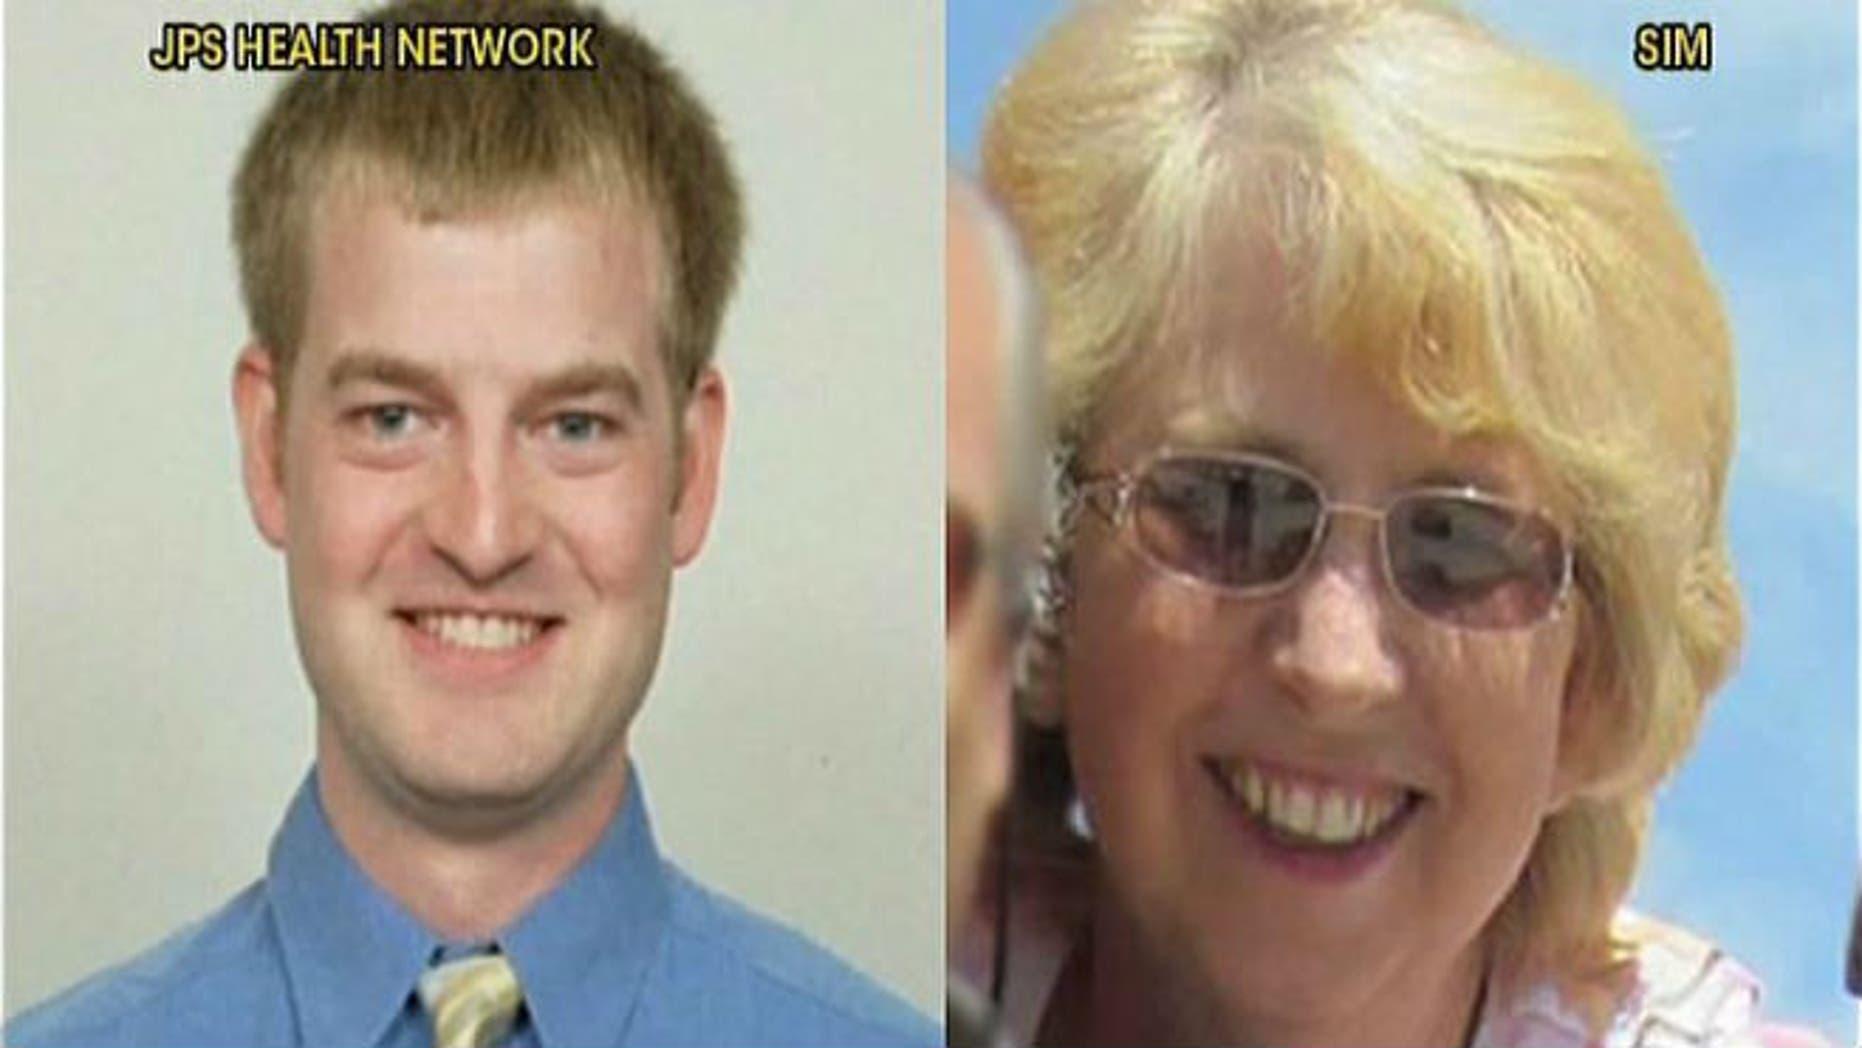 Dr. Kent Brantly and Nancy Writebol, courtesy of SIM